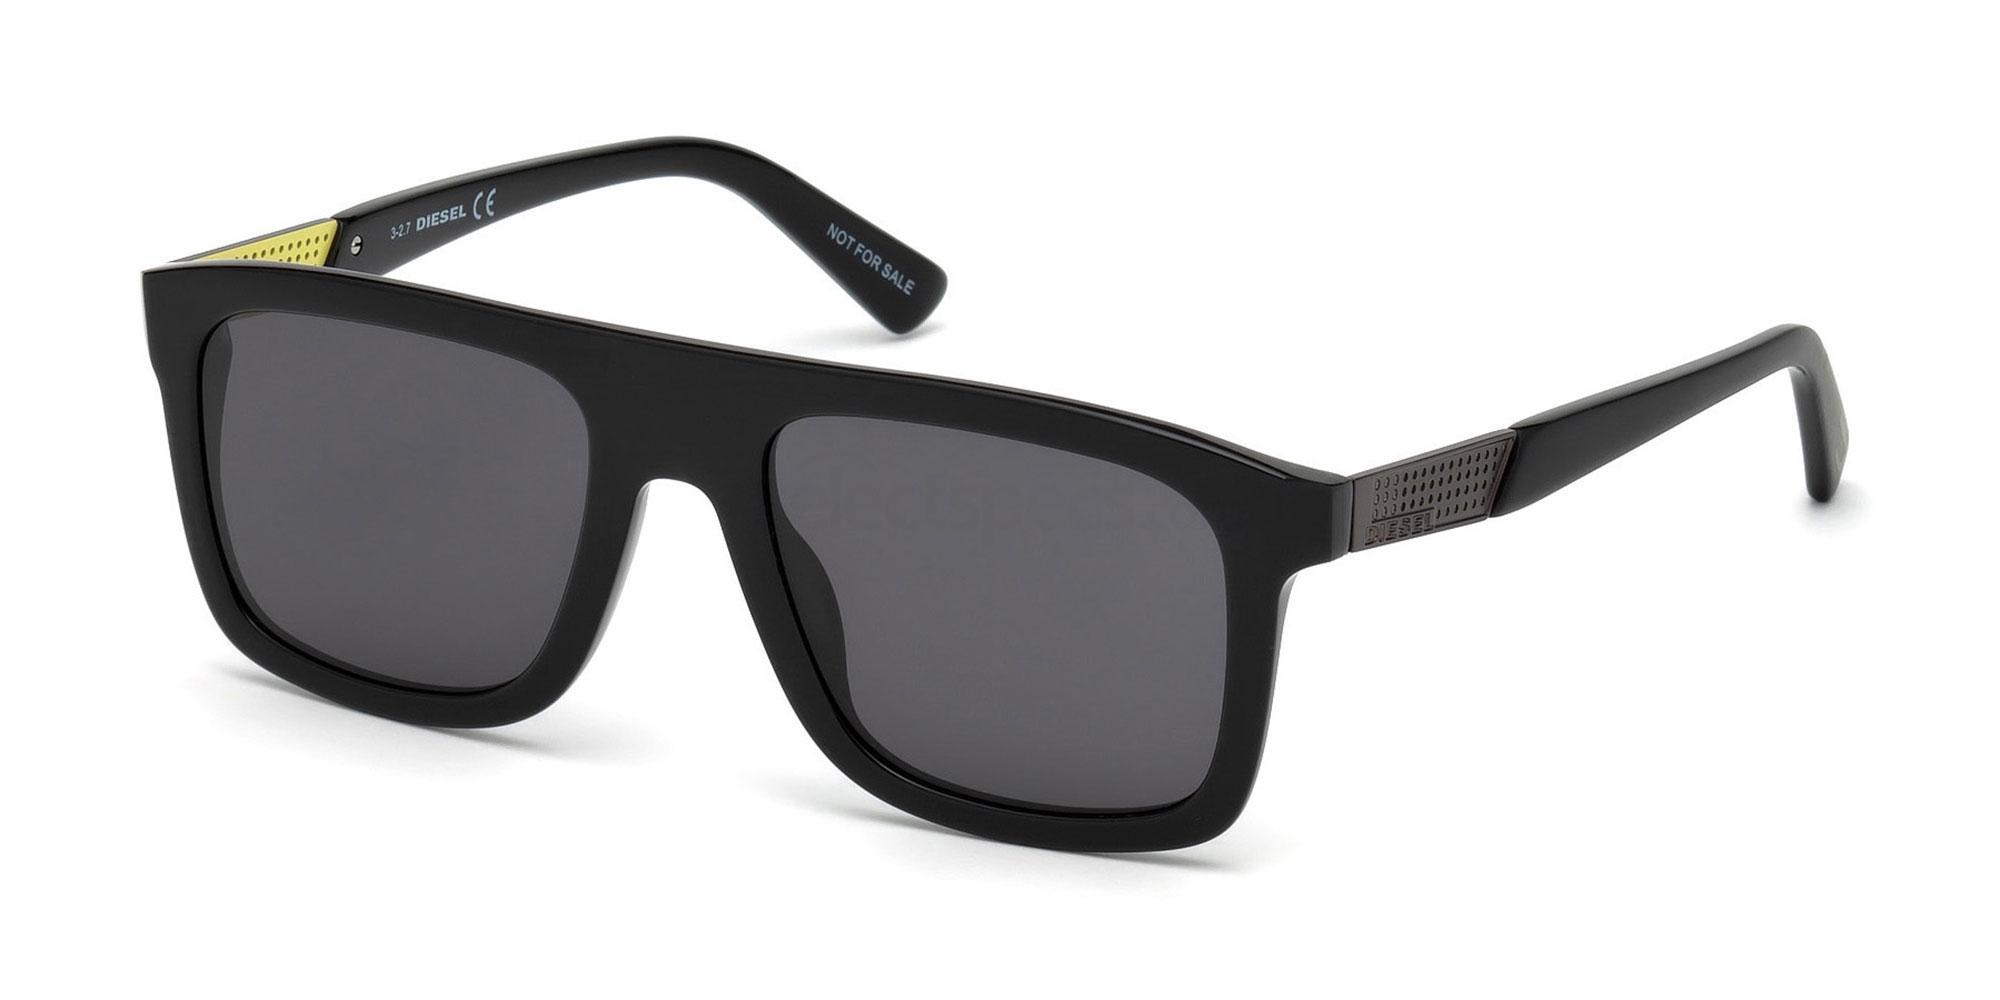 01A DL0268 Sunglasses, Diesel